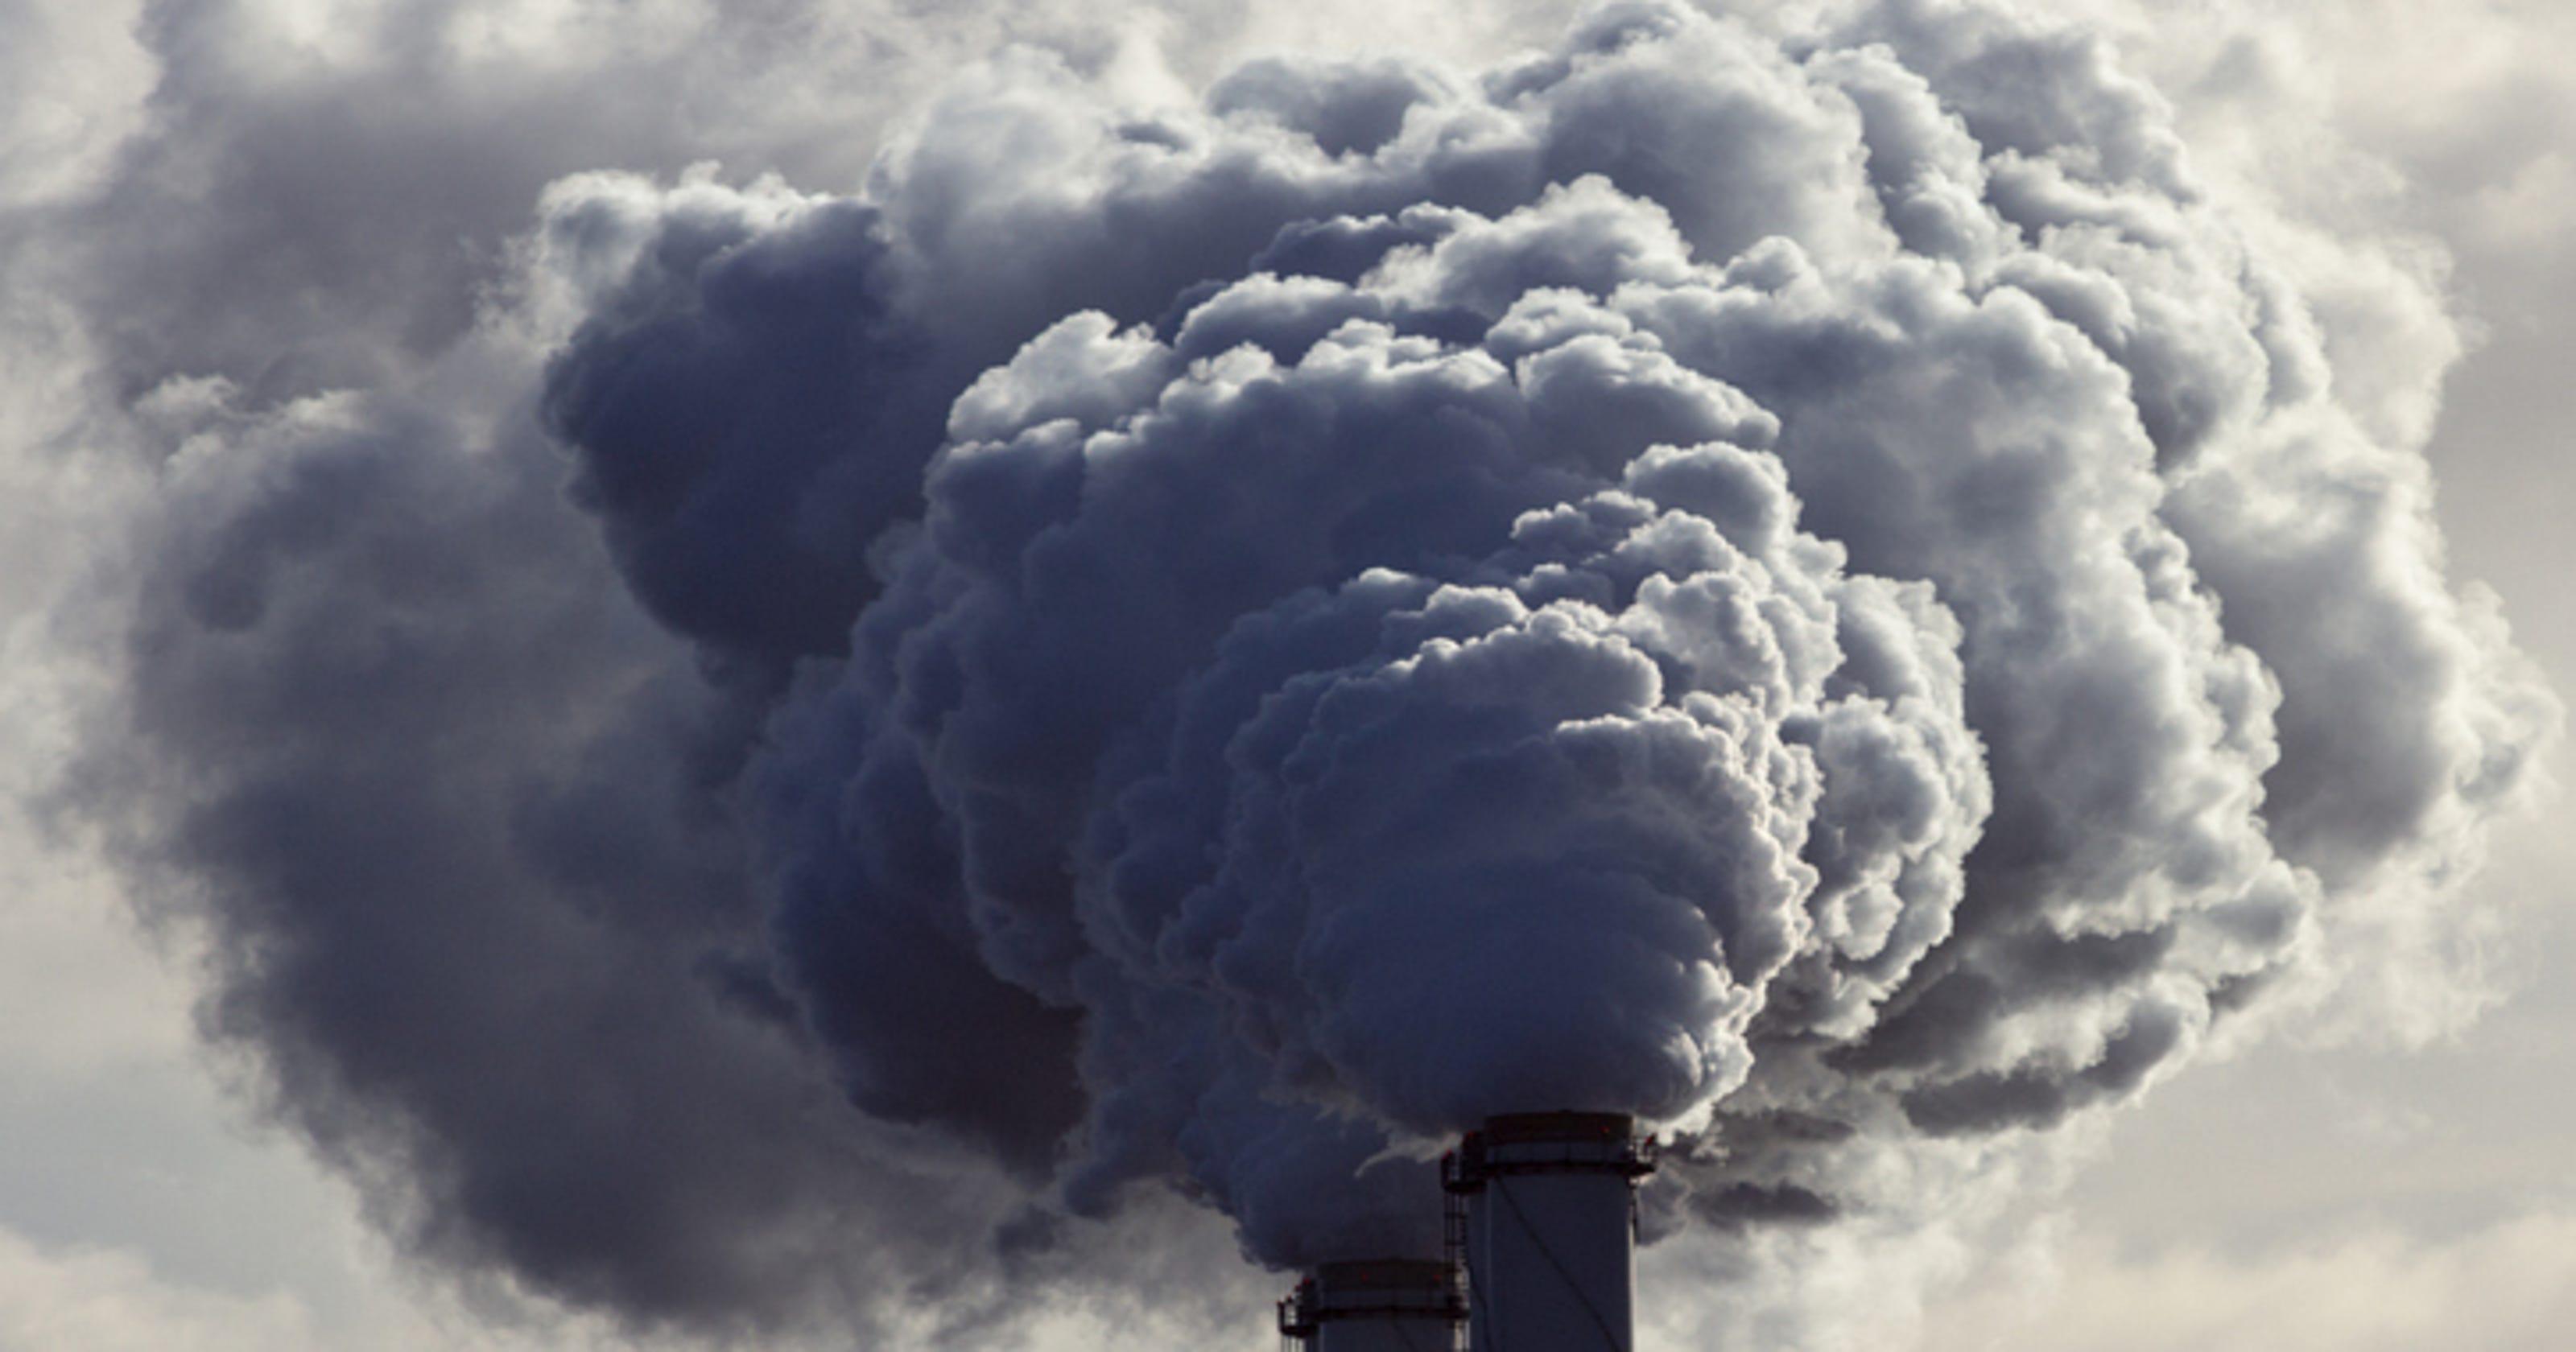 Climate change: Coal still king as global carbon emissions soar